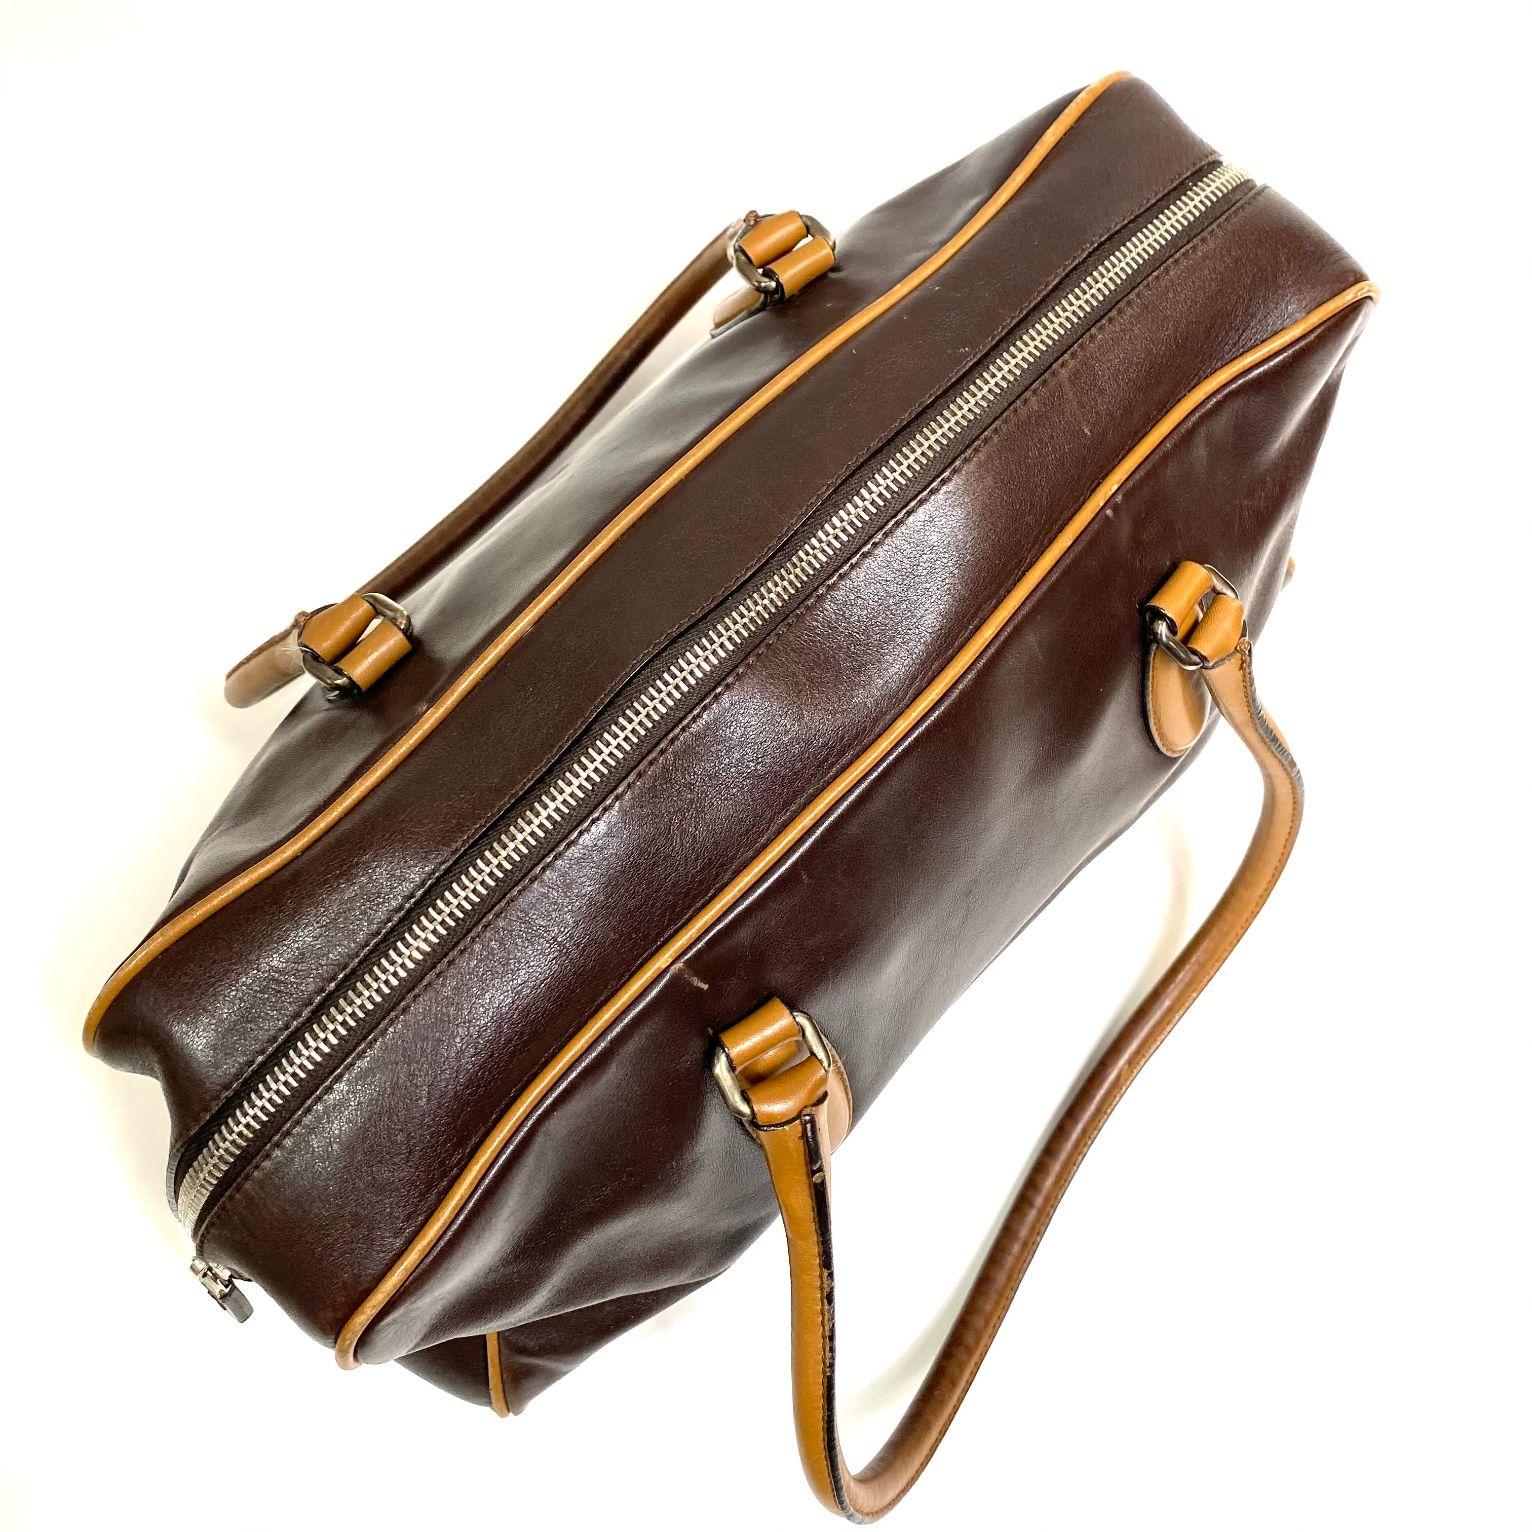 Bolsa Miu Miu Vintage Marrom